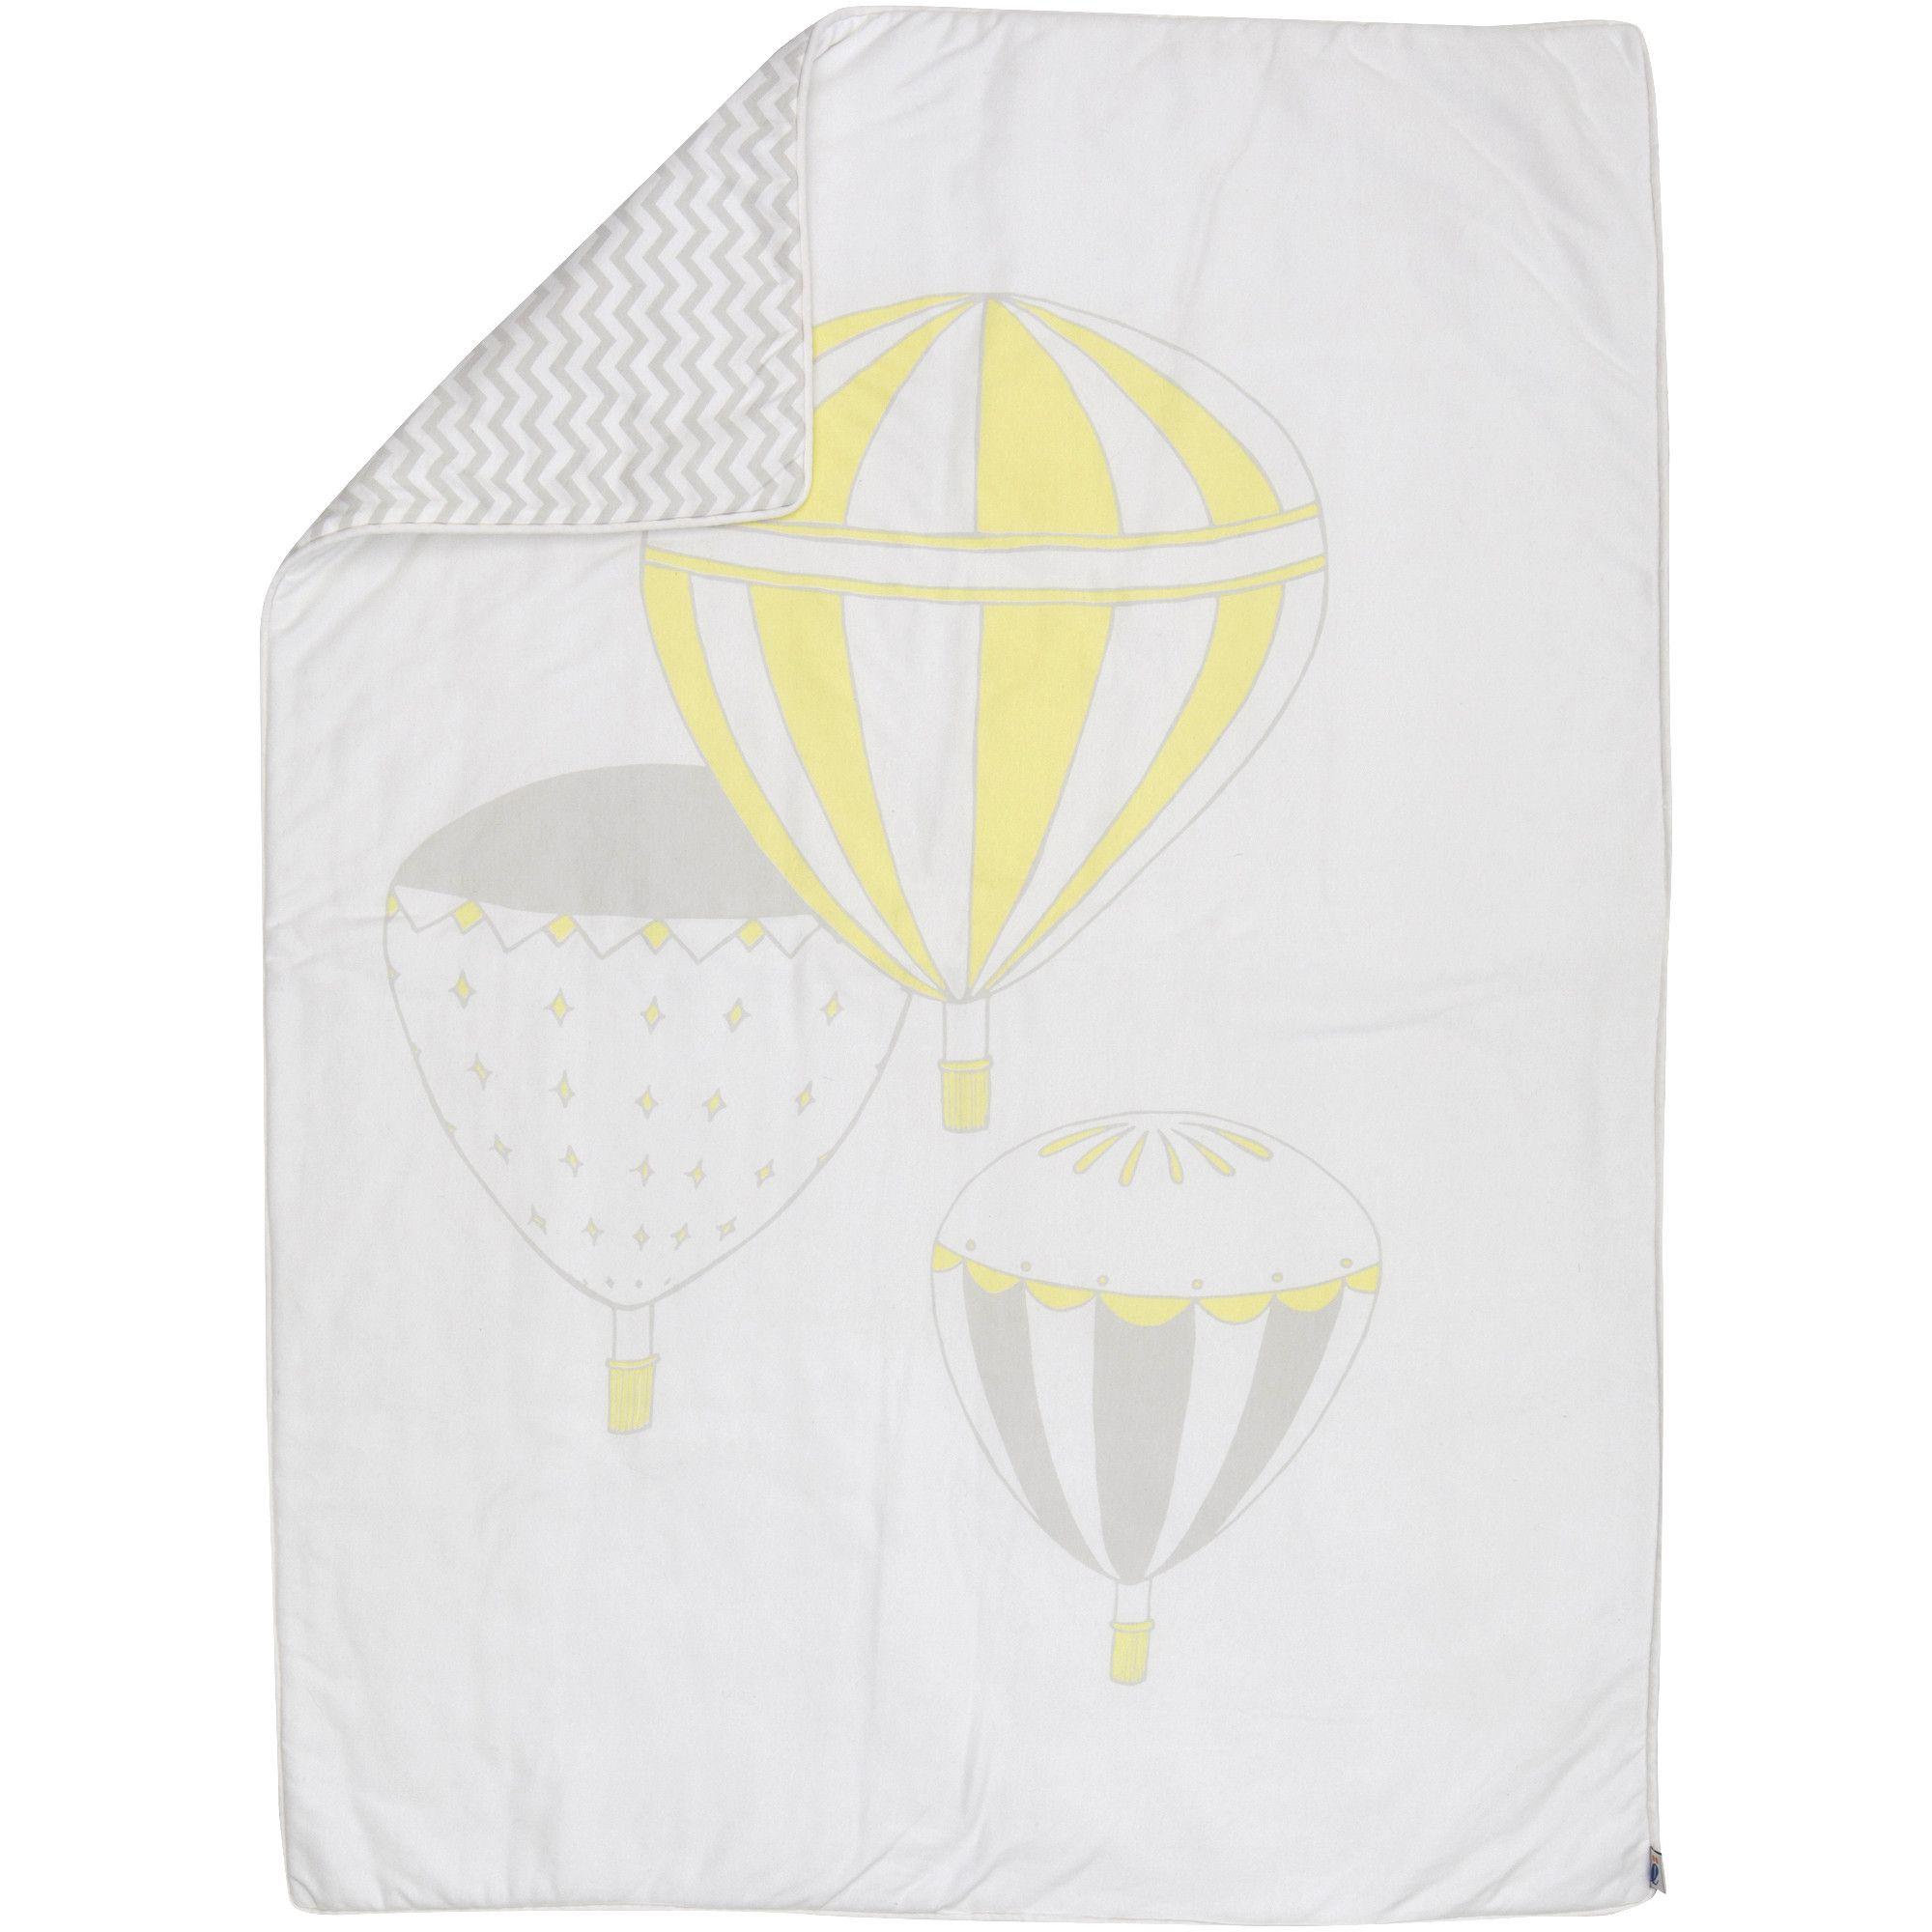 Hot Air Balloons Reversible Duvet Cover